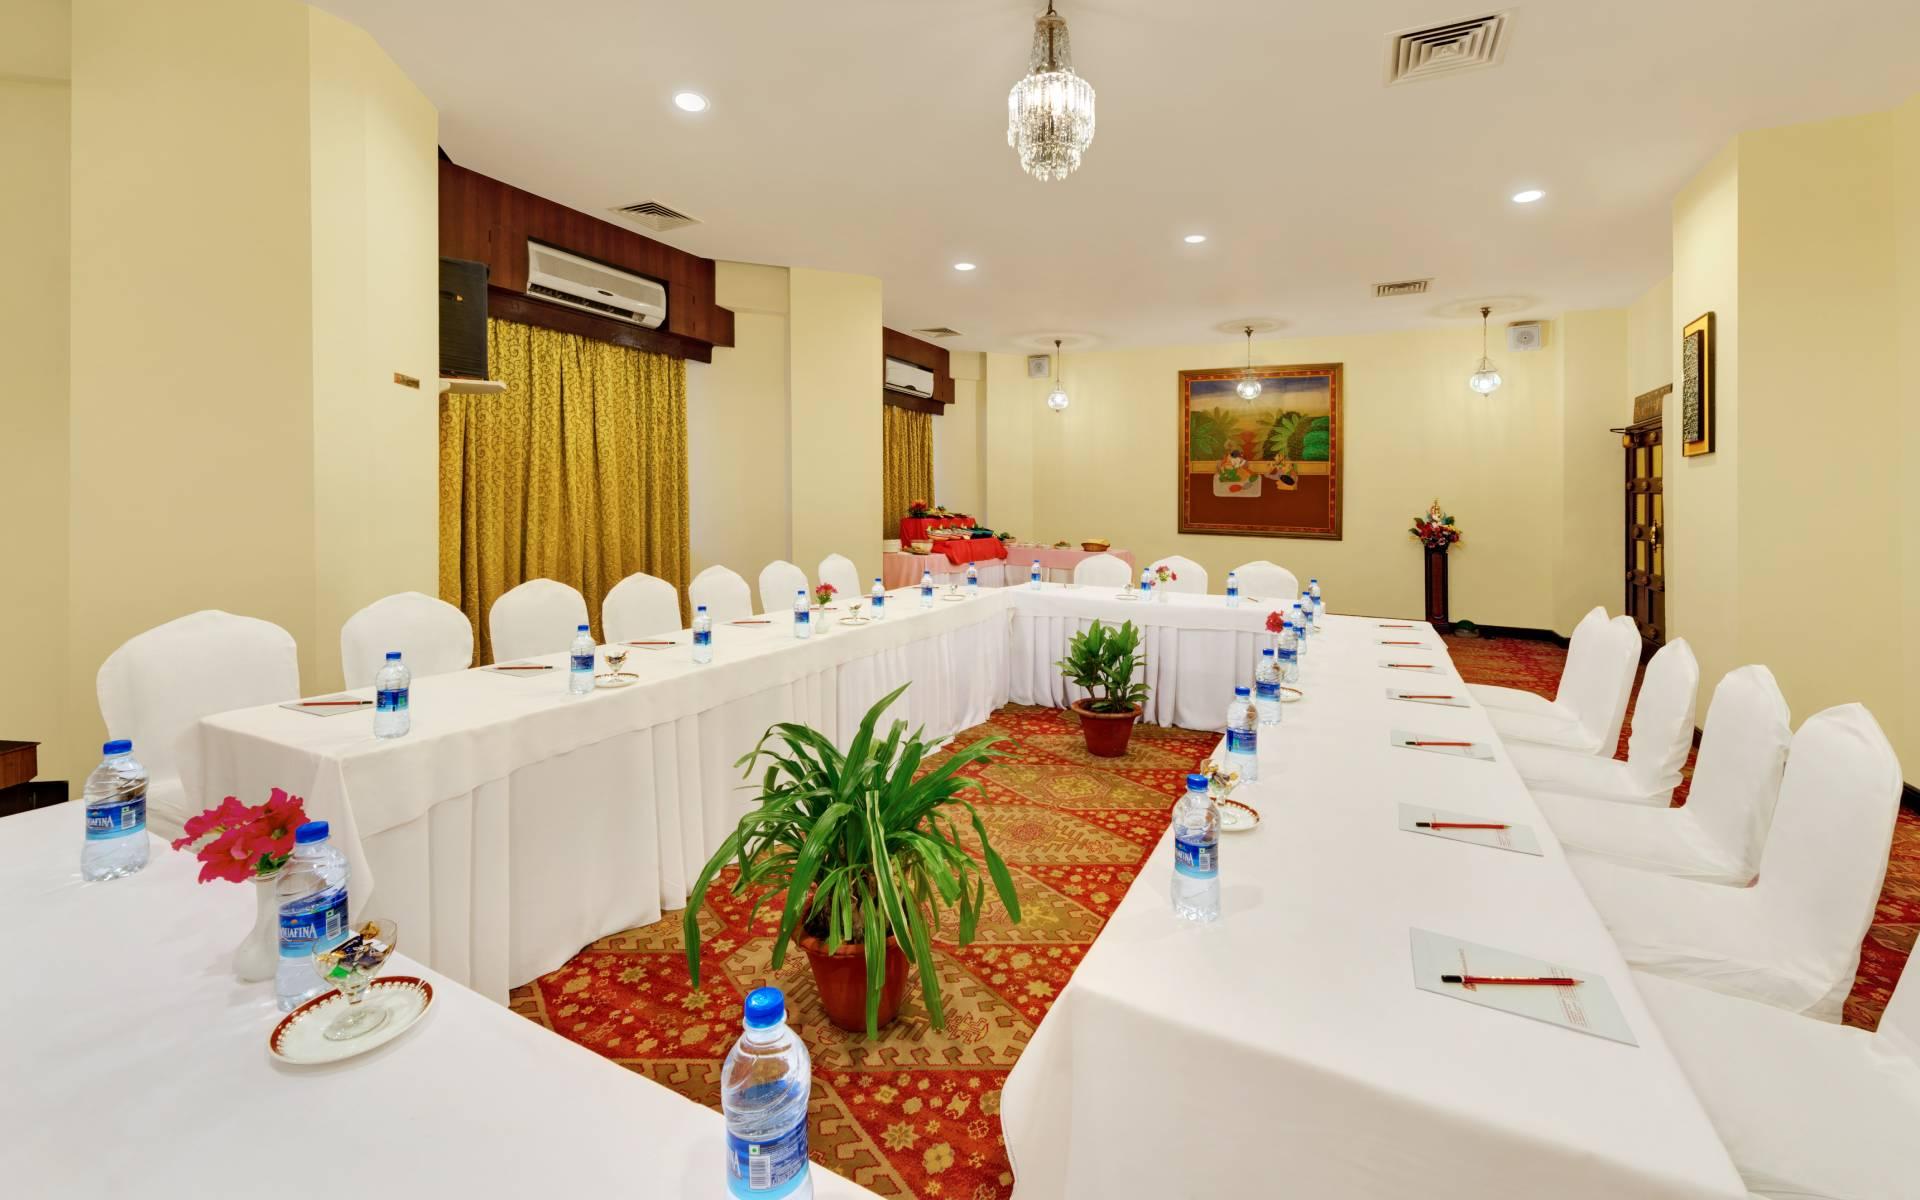 Conference Hall ambassador ajanta aurangabad - The Ambassador   Heritage Hotels in Mumbai, Aurangabad, Chennai - Meetings & Events